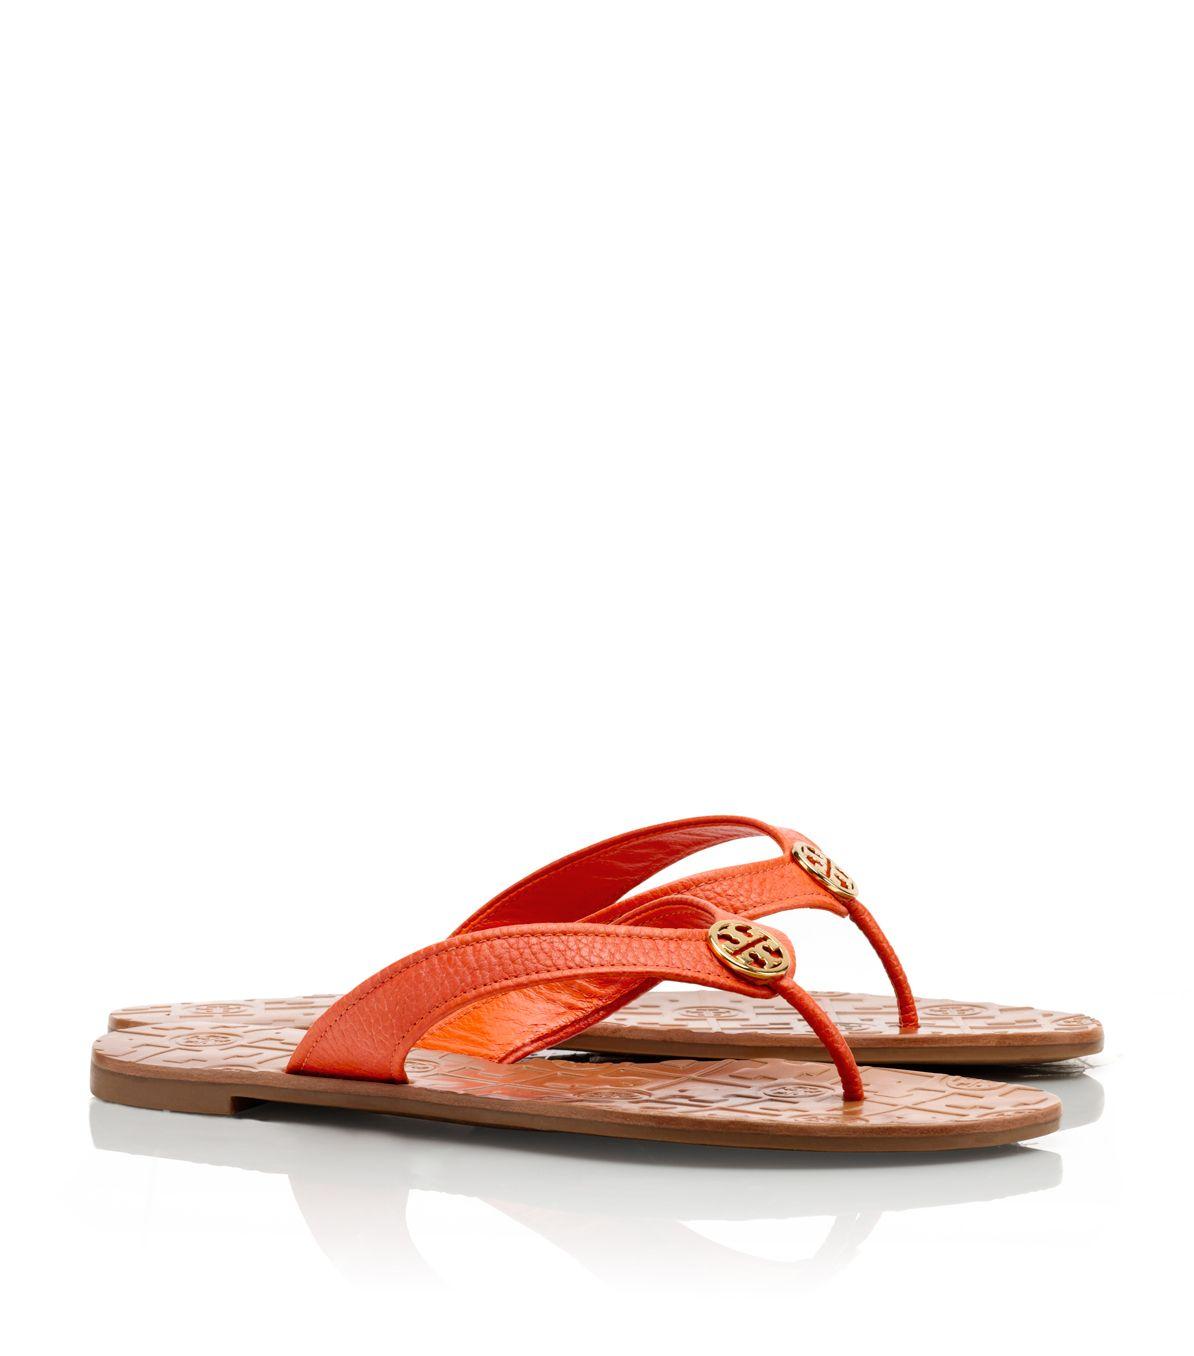 36f6cbc29e57 Tory Burch Tumbled Leather Thora Sandal in Orange - Lyst